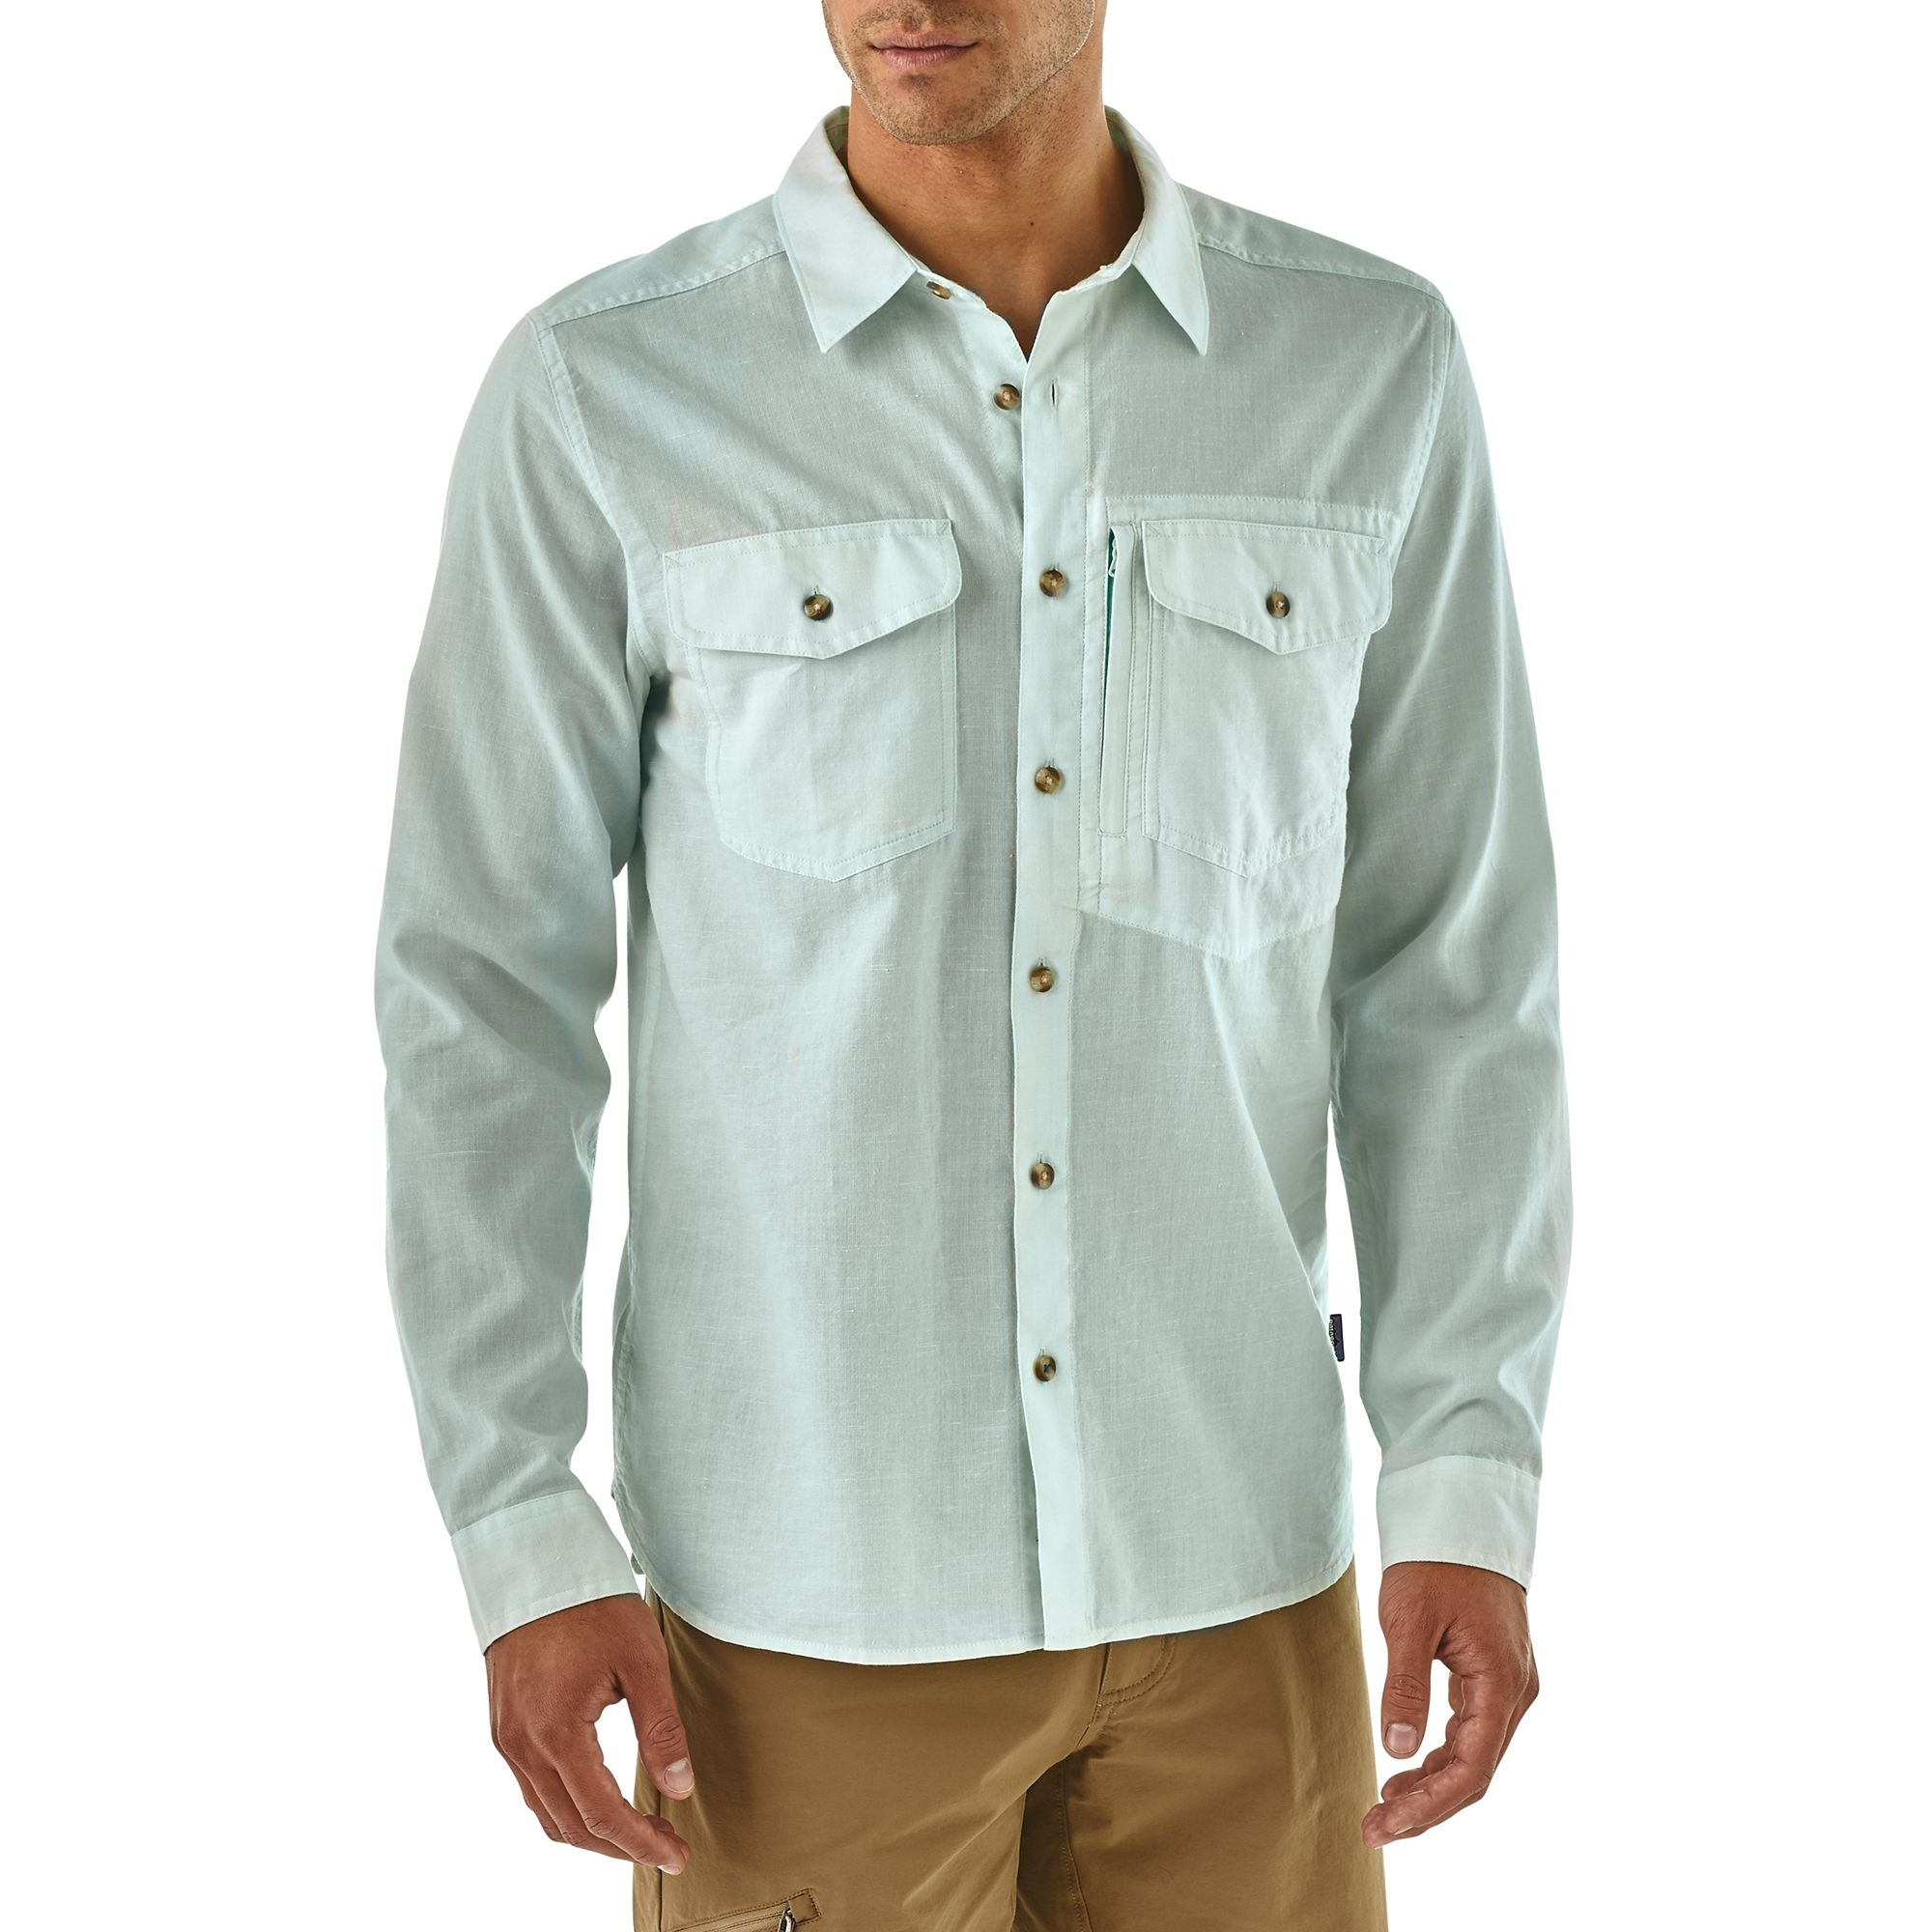 Braasport Patagonia Long Sleeved Fjord Flannel Shirt